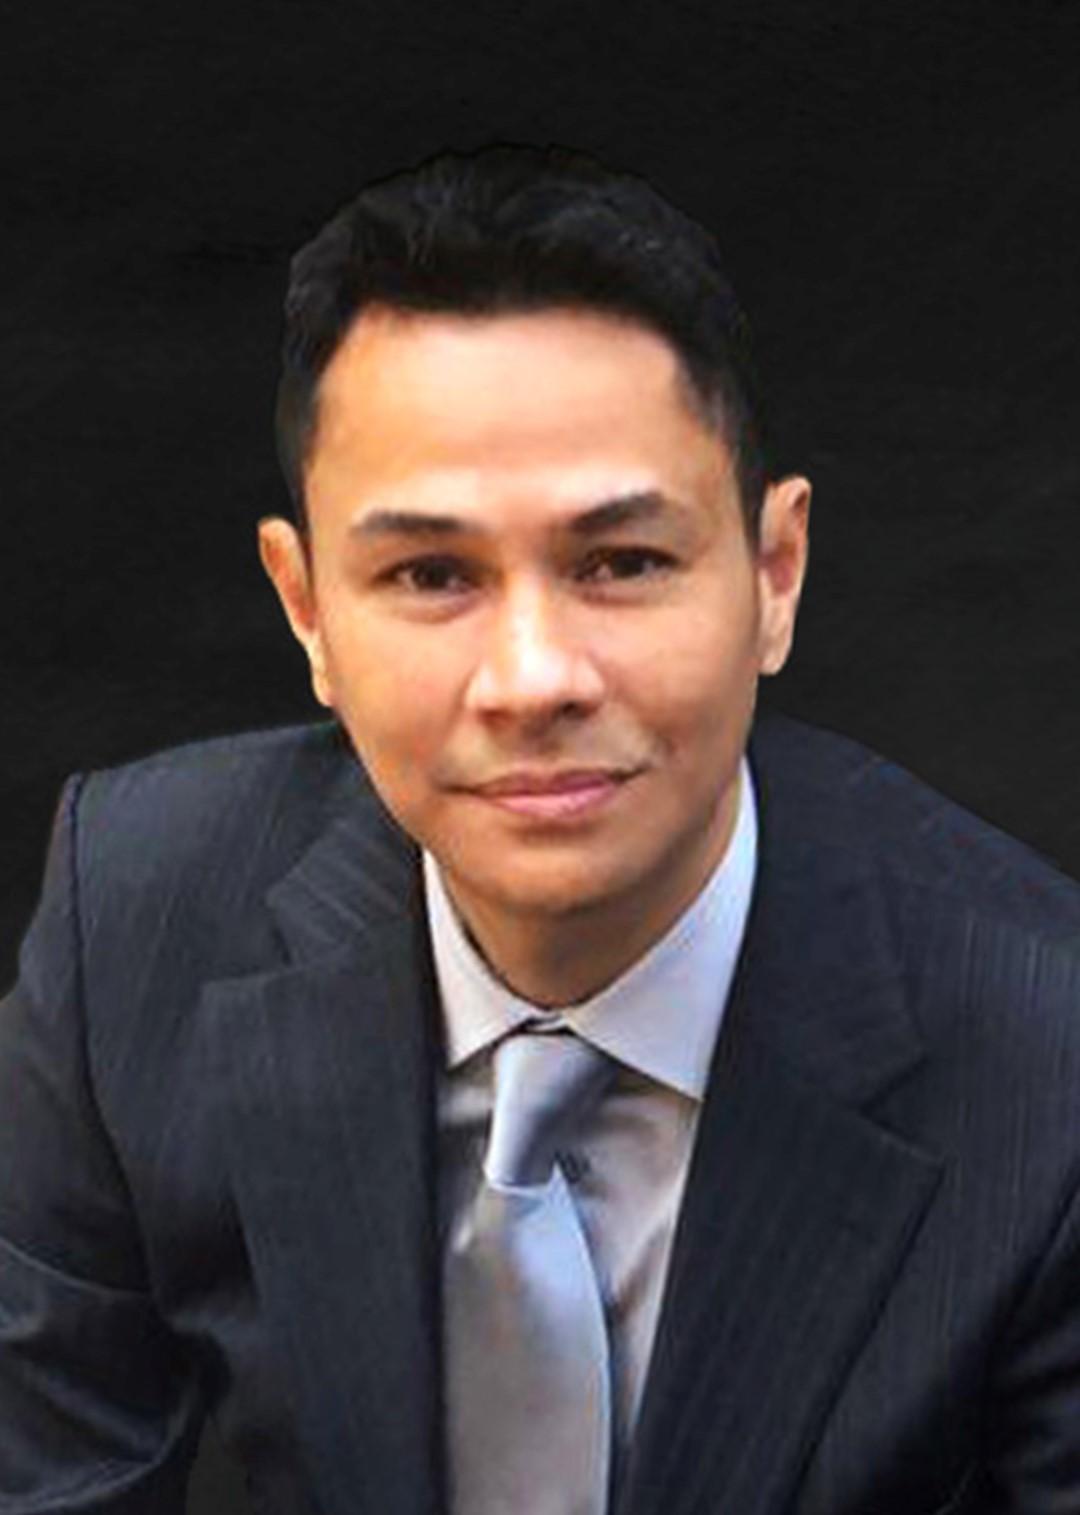 Naza Italia Chaiman YTM Dato Tunku Shazuddin